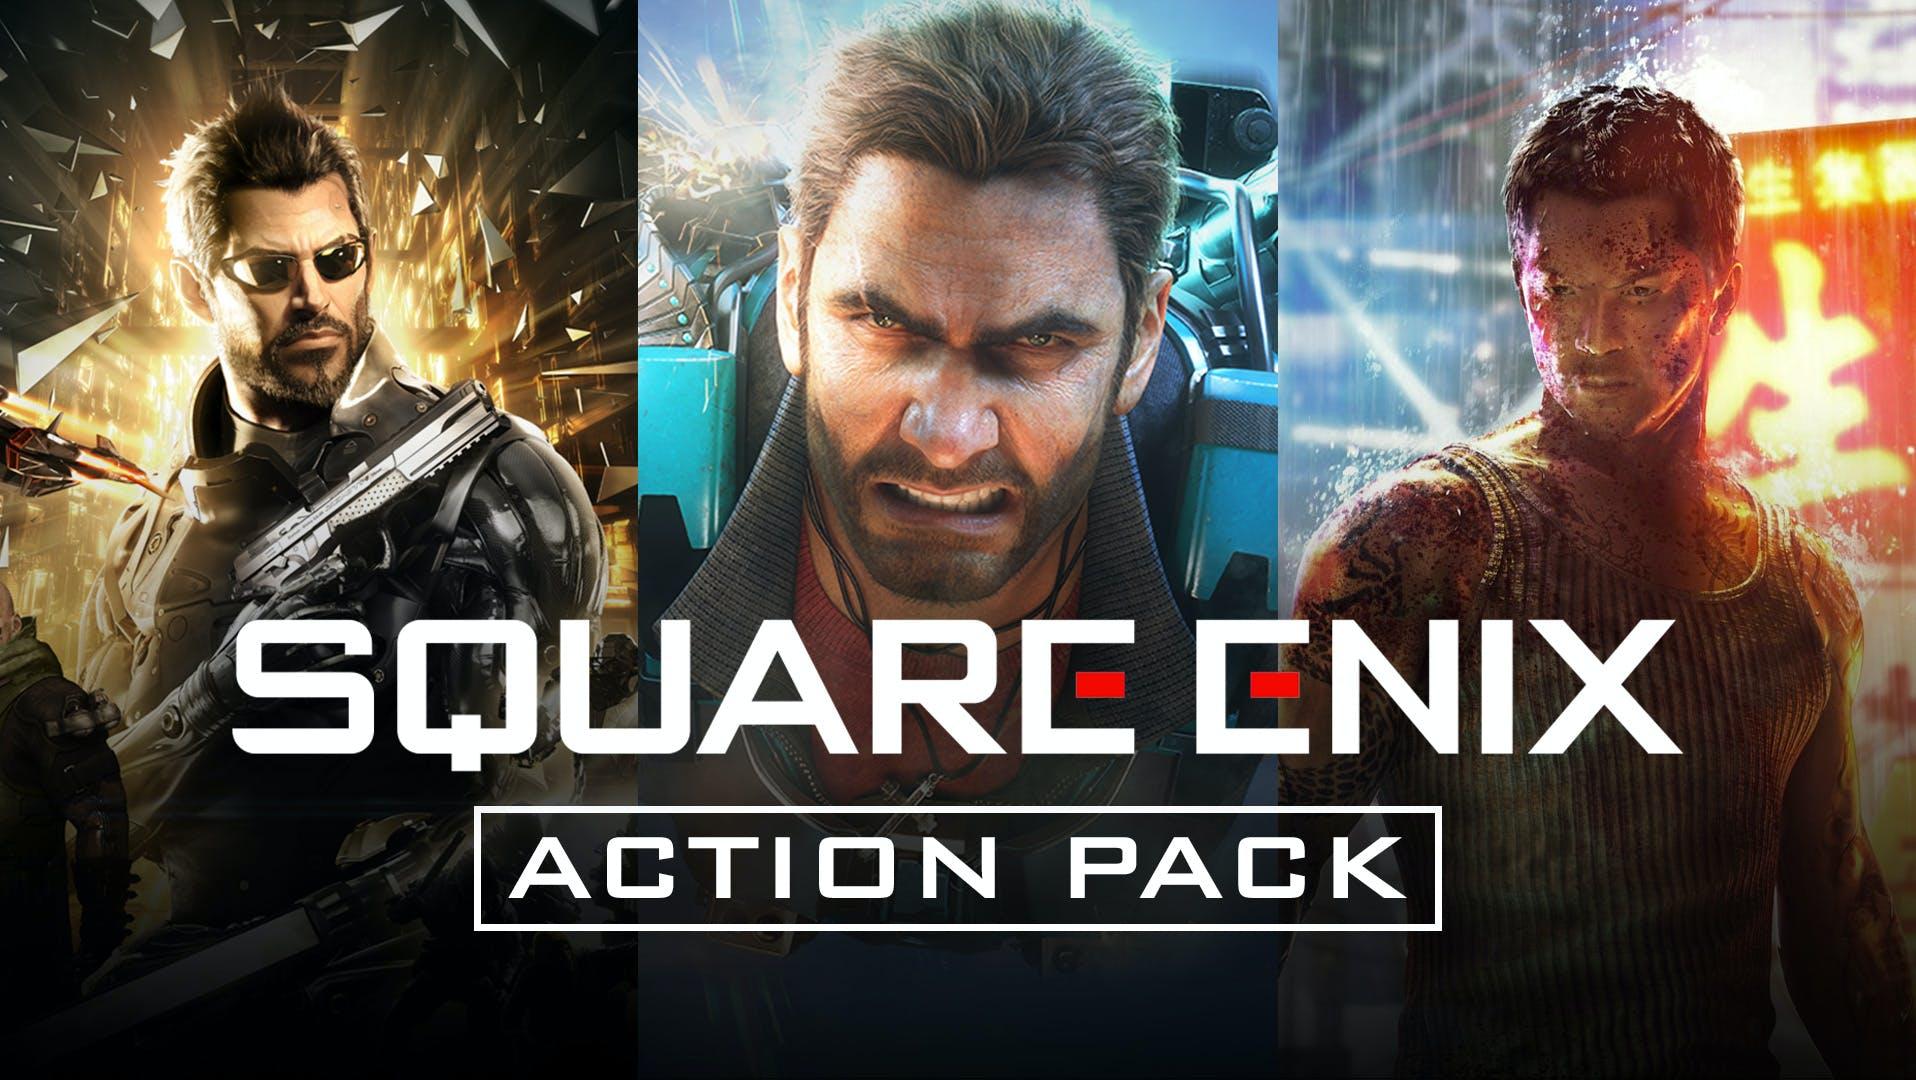 Square Enix Action Pack